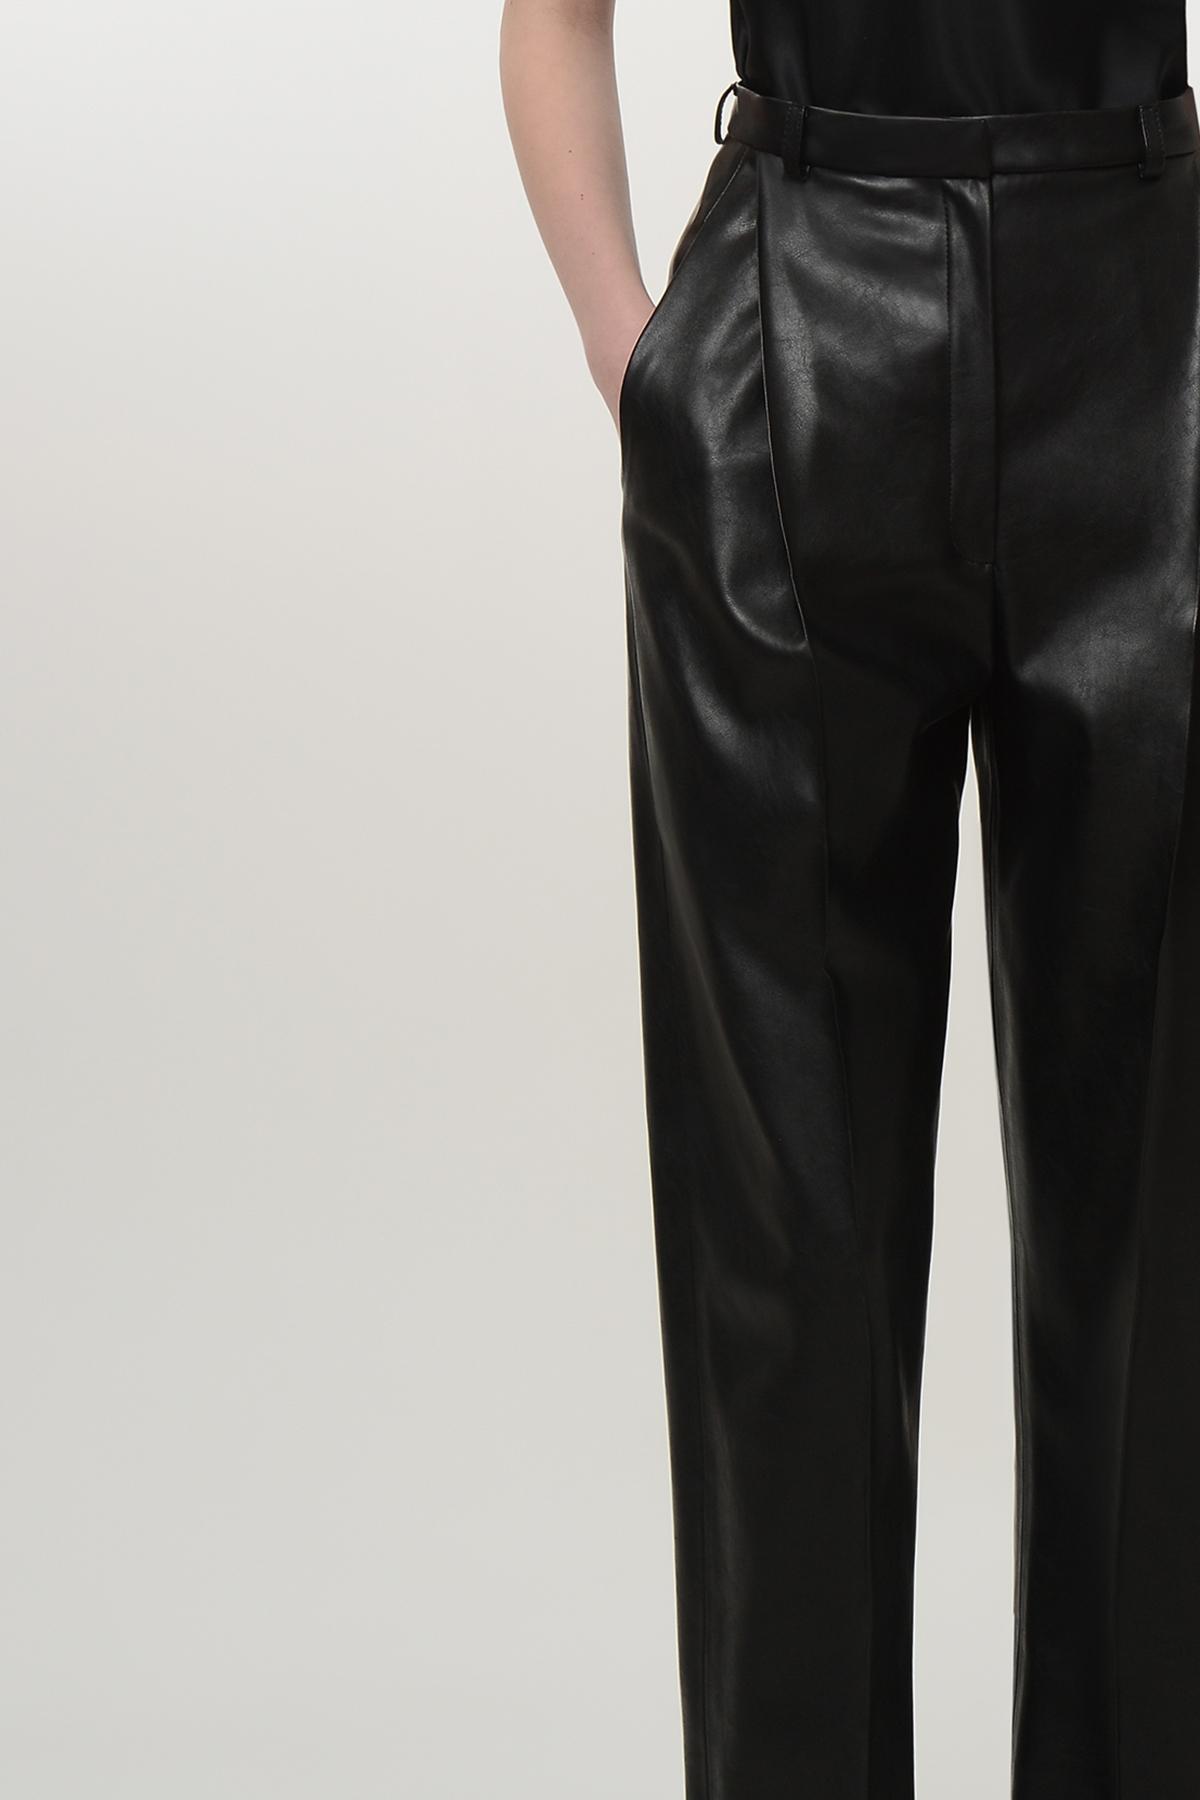 High waisted vegan leather paggy pants 3